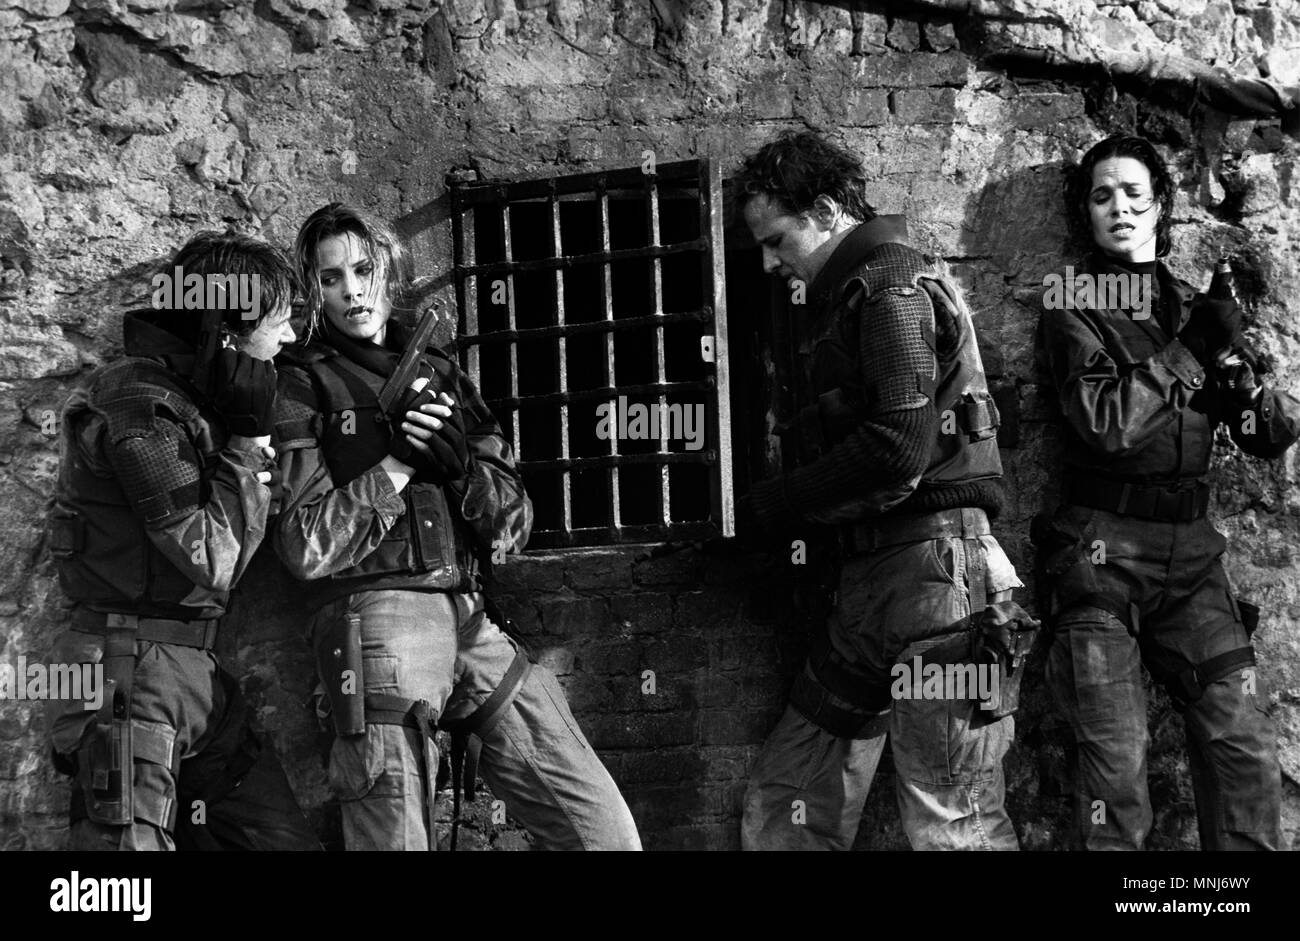 Adrenalin: Fear the Rush, aka: Ultimate Chase _ Die letzte Jagd, USA 1996, Regie: Albert Pyun, Darsteller: Nrobert Weisser, Natasha Henstridge, Christopher Lambert, Elizabeth Barondes - Stock Image